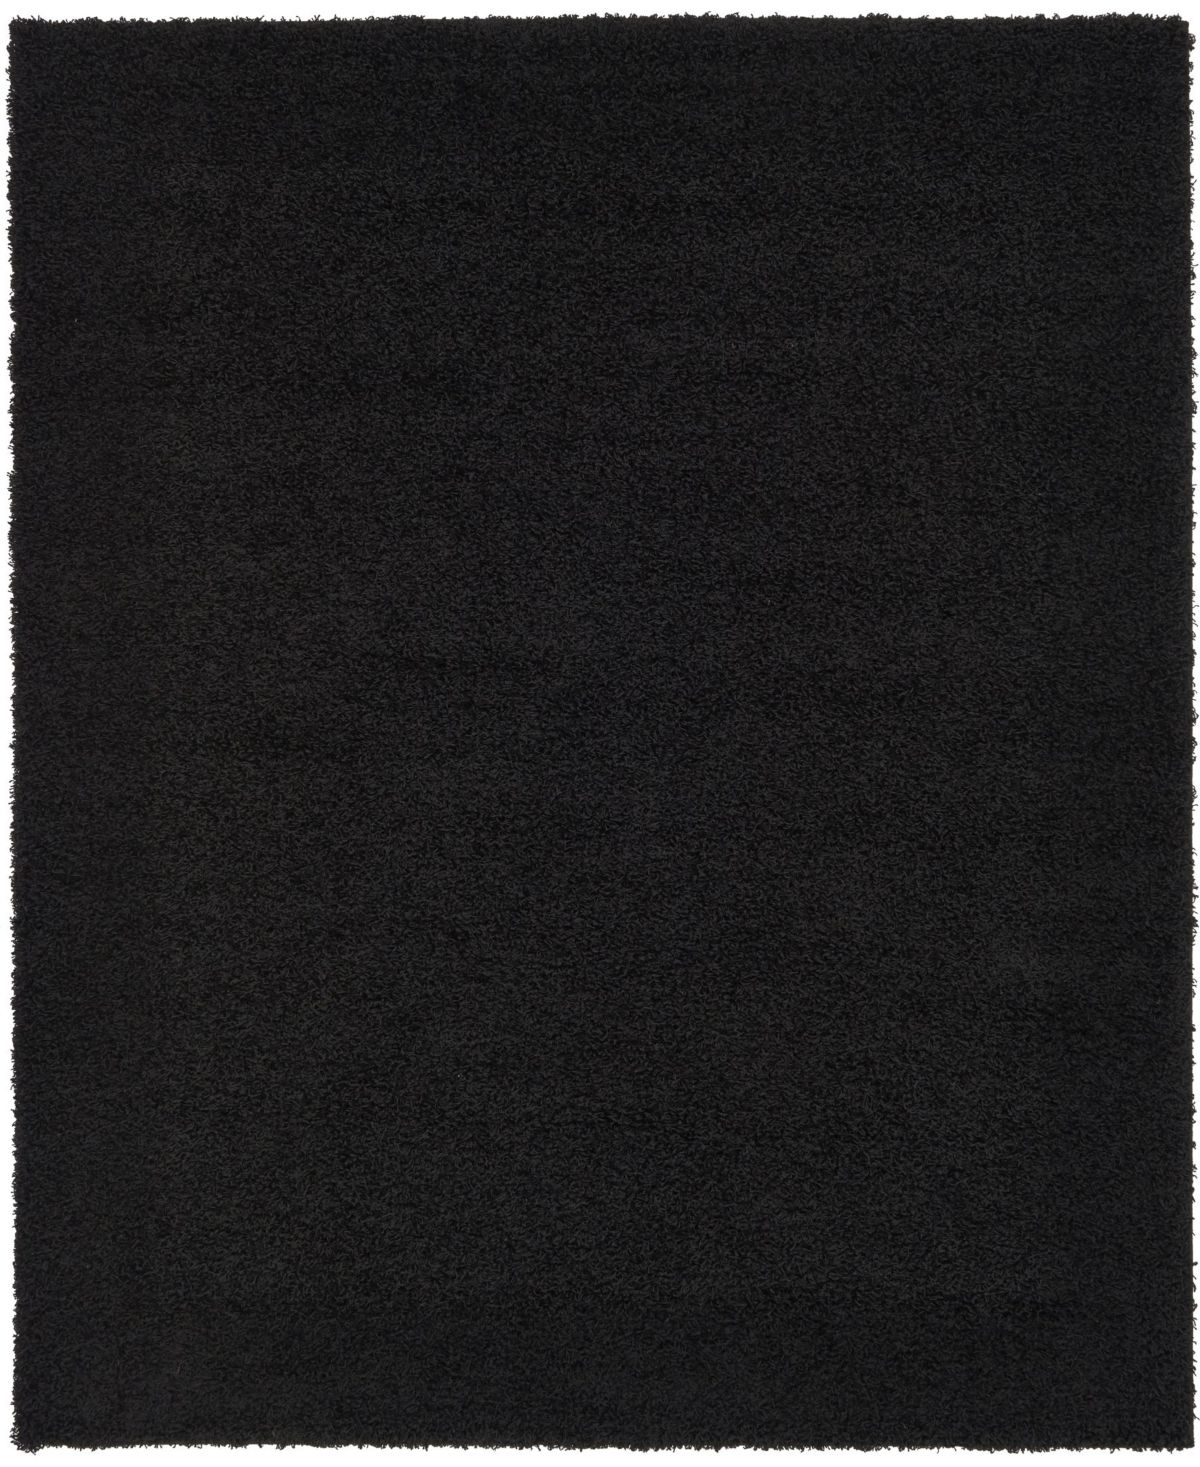 Bridgeport Home Exact Shag Exs1 Jet Black 8 X 10 Area Rug Jet Black In 2020 Area Throw Rugs Duralee Fabrics Black Area Rugs